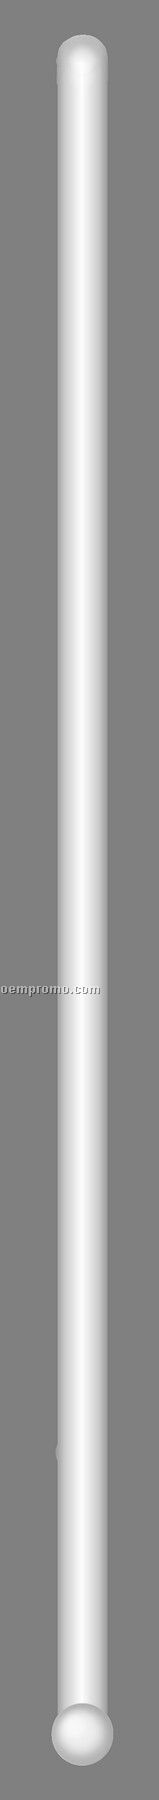 "D50 7"" Round Crystal Rod Stirrer"